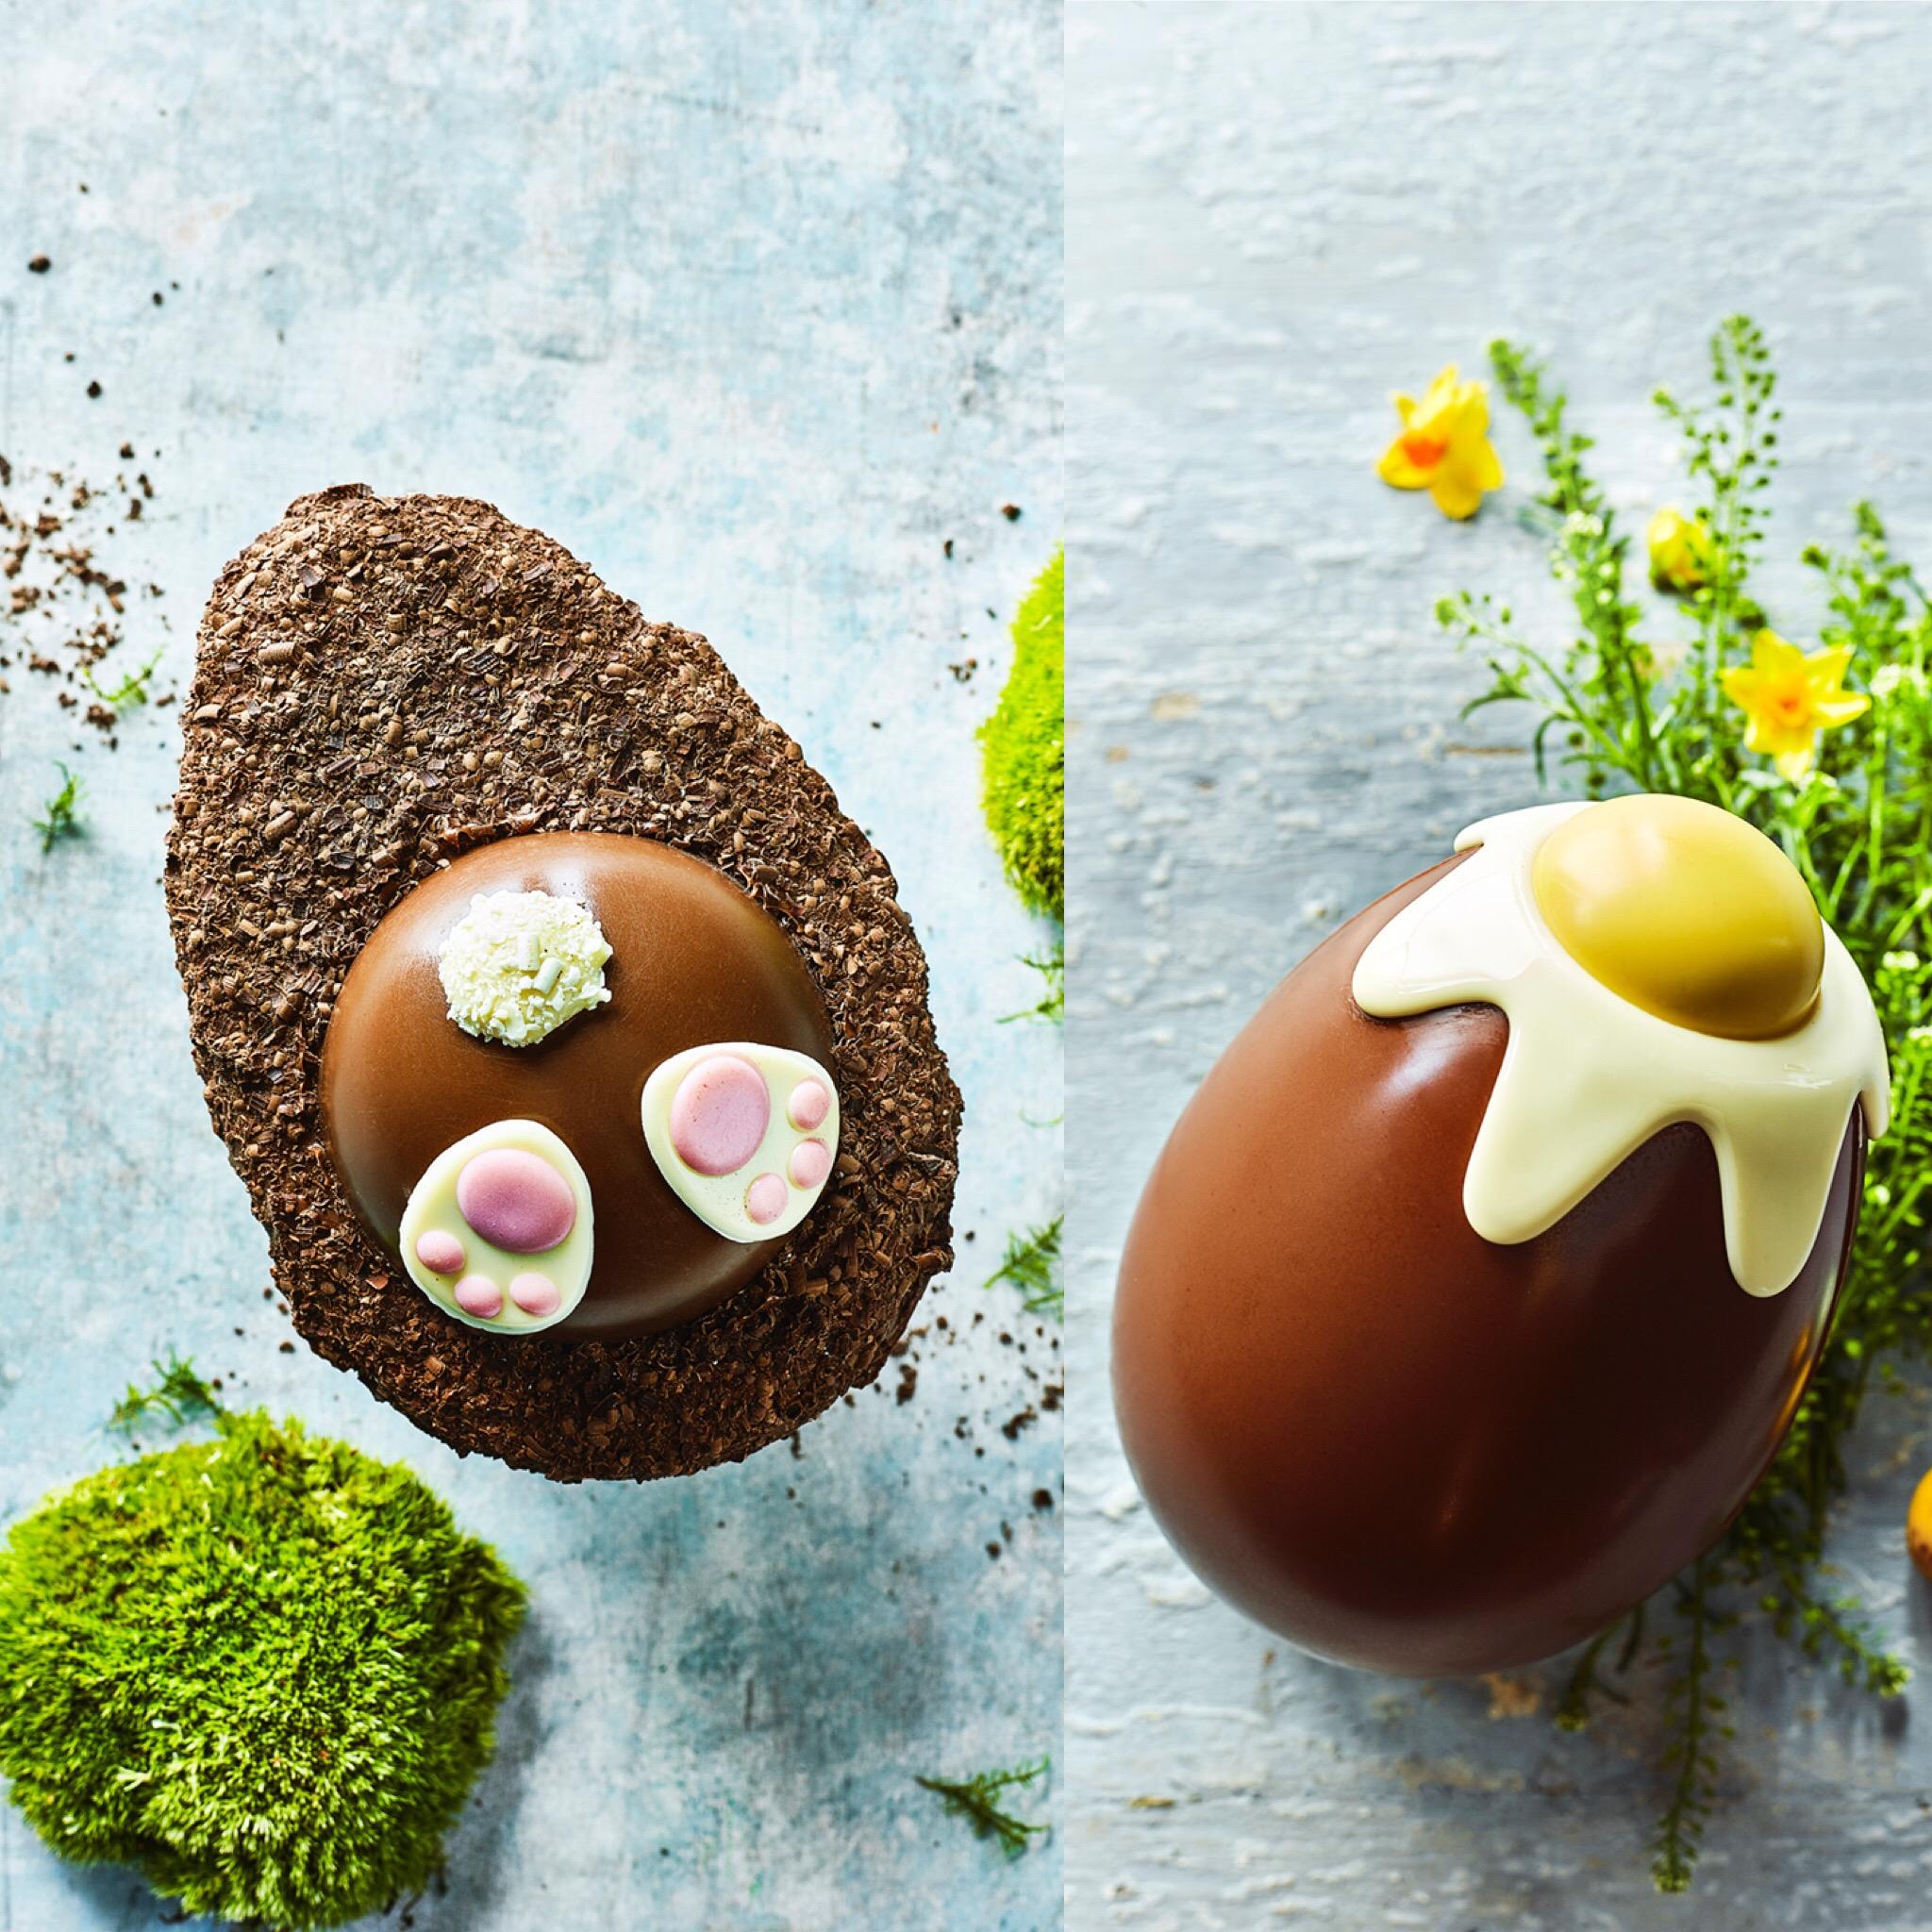 Burrowing Bunny egg and Dippy Egg